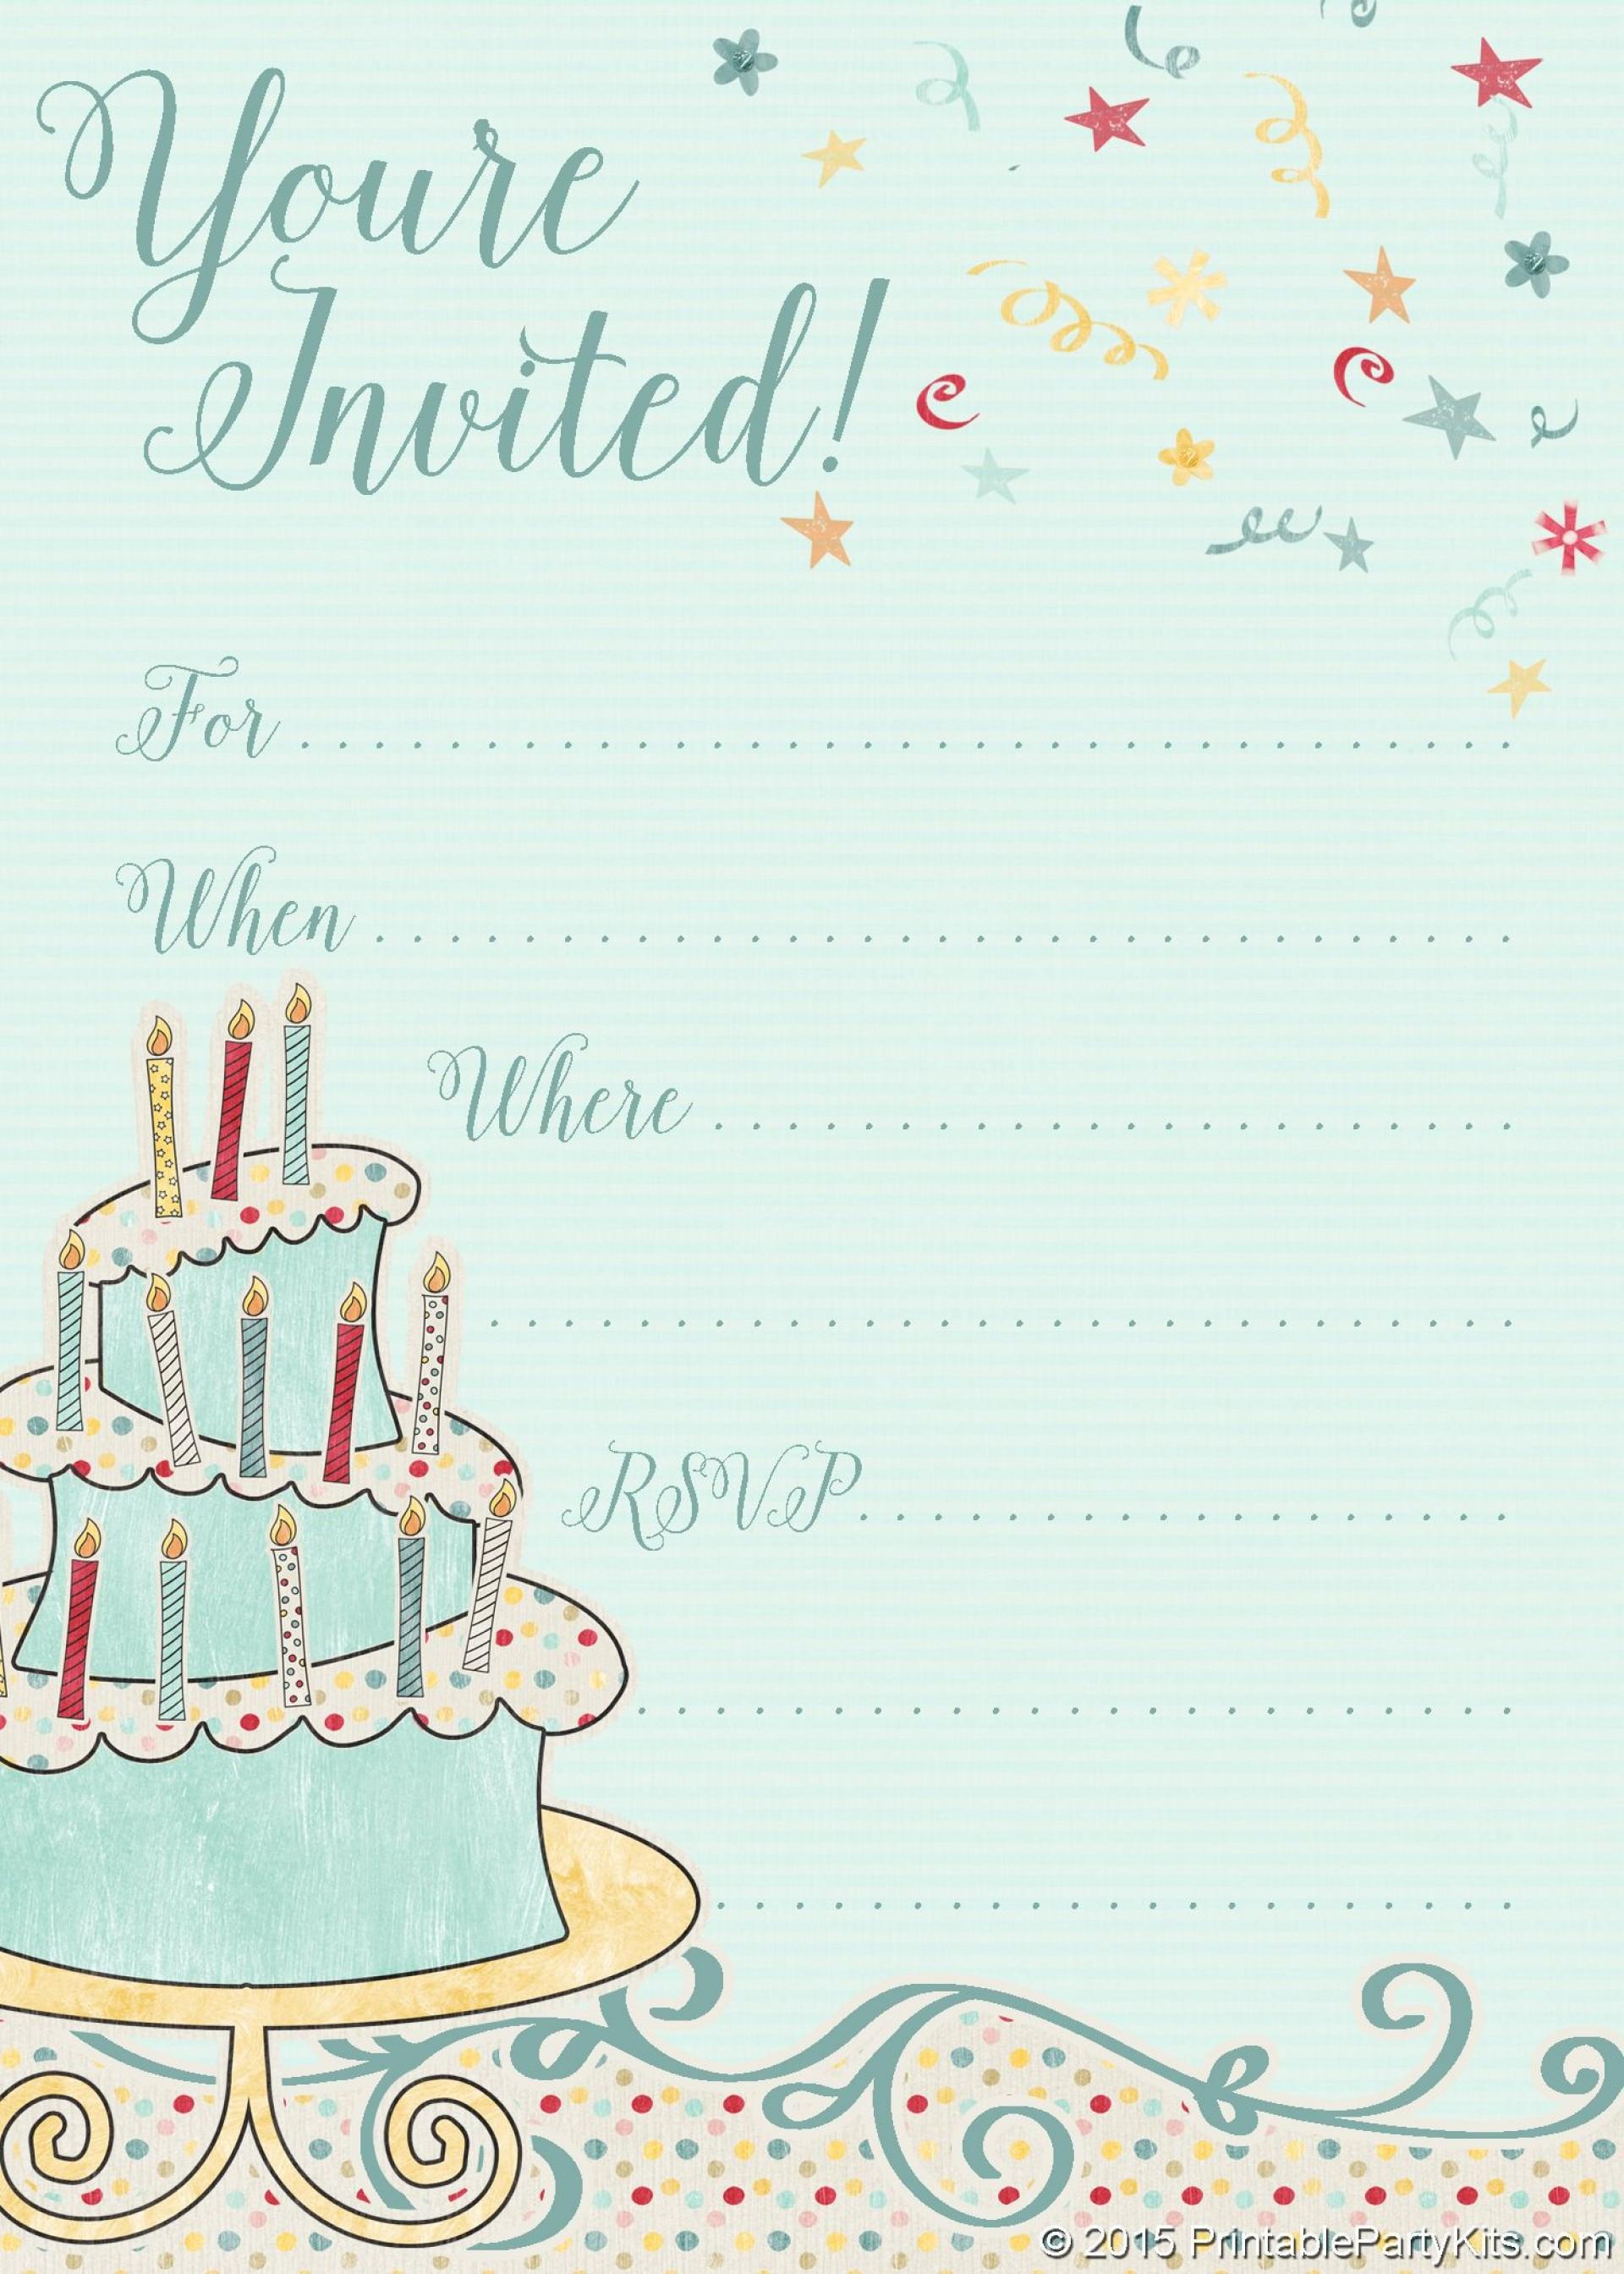 000 Fearsome Free Online Birthday Invitation Maker Printable Design  1st Card1920